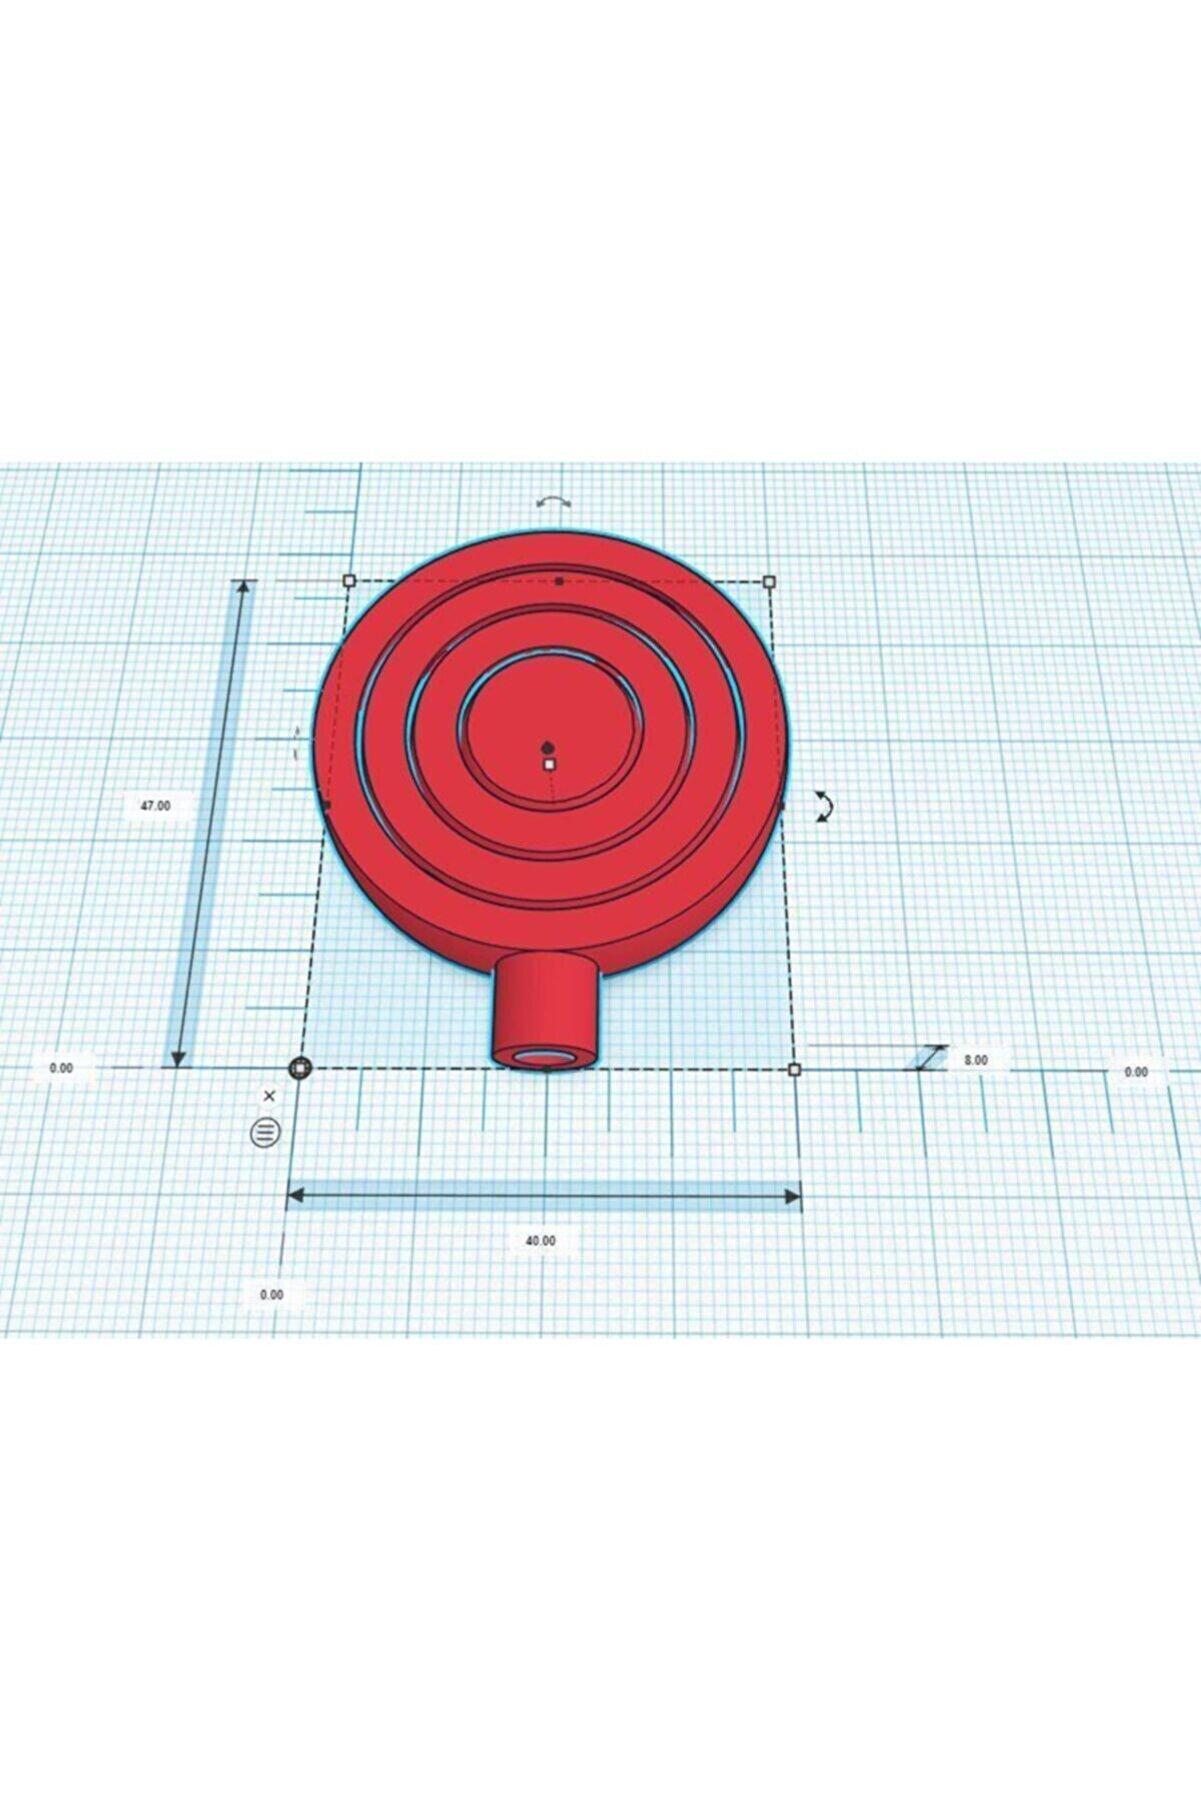 SudoCheap 5mm Mil Için Gyro Spinner Organik Plastikten Organizer